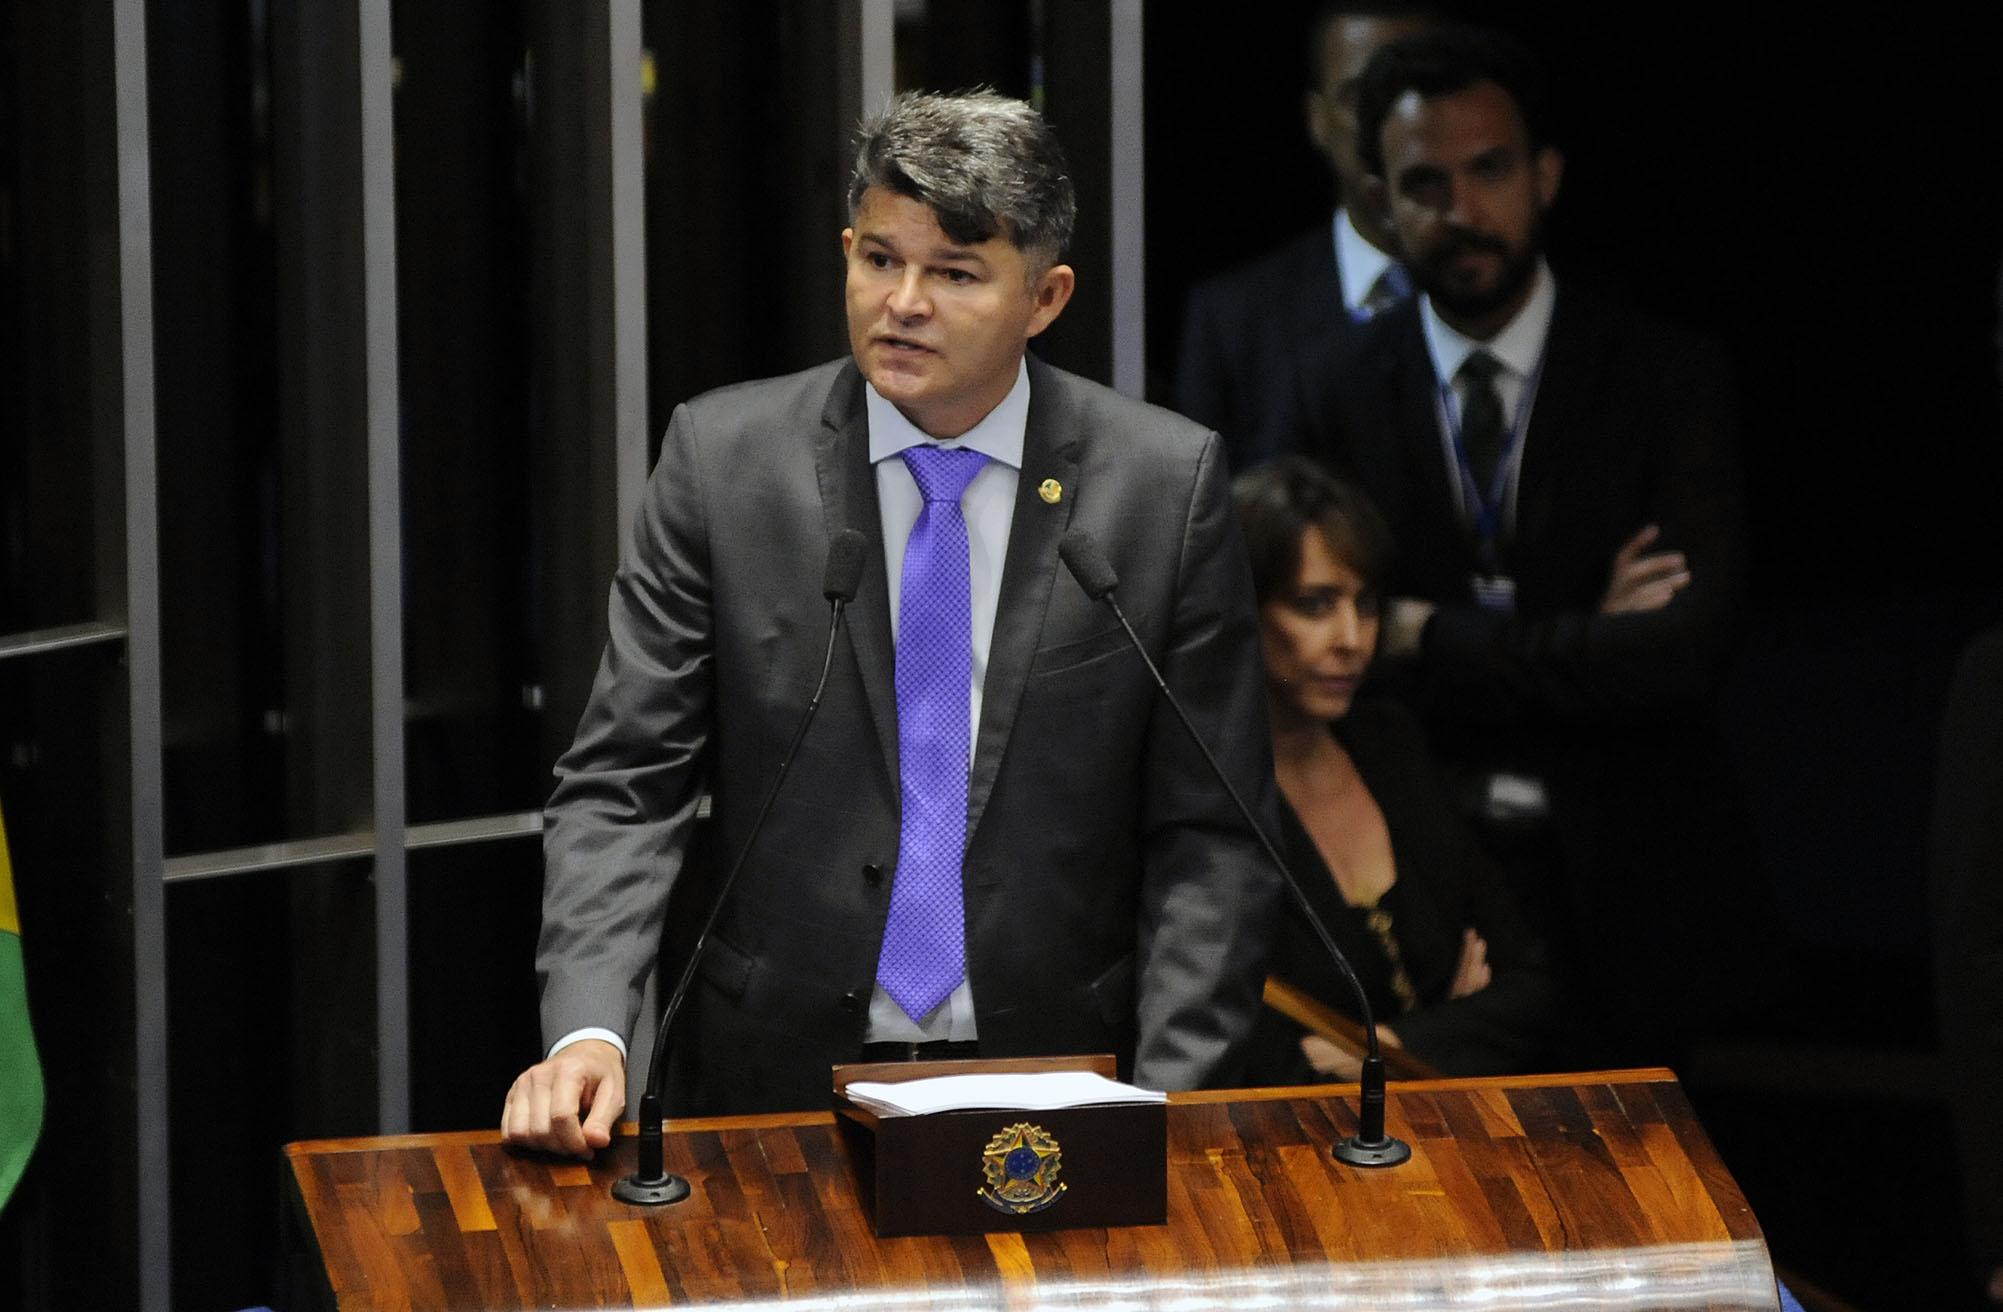 Eleições para a presidência do Senado Federal. Sen. José Medeiros (PSD) candidato a presidência